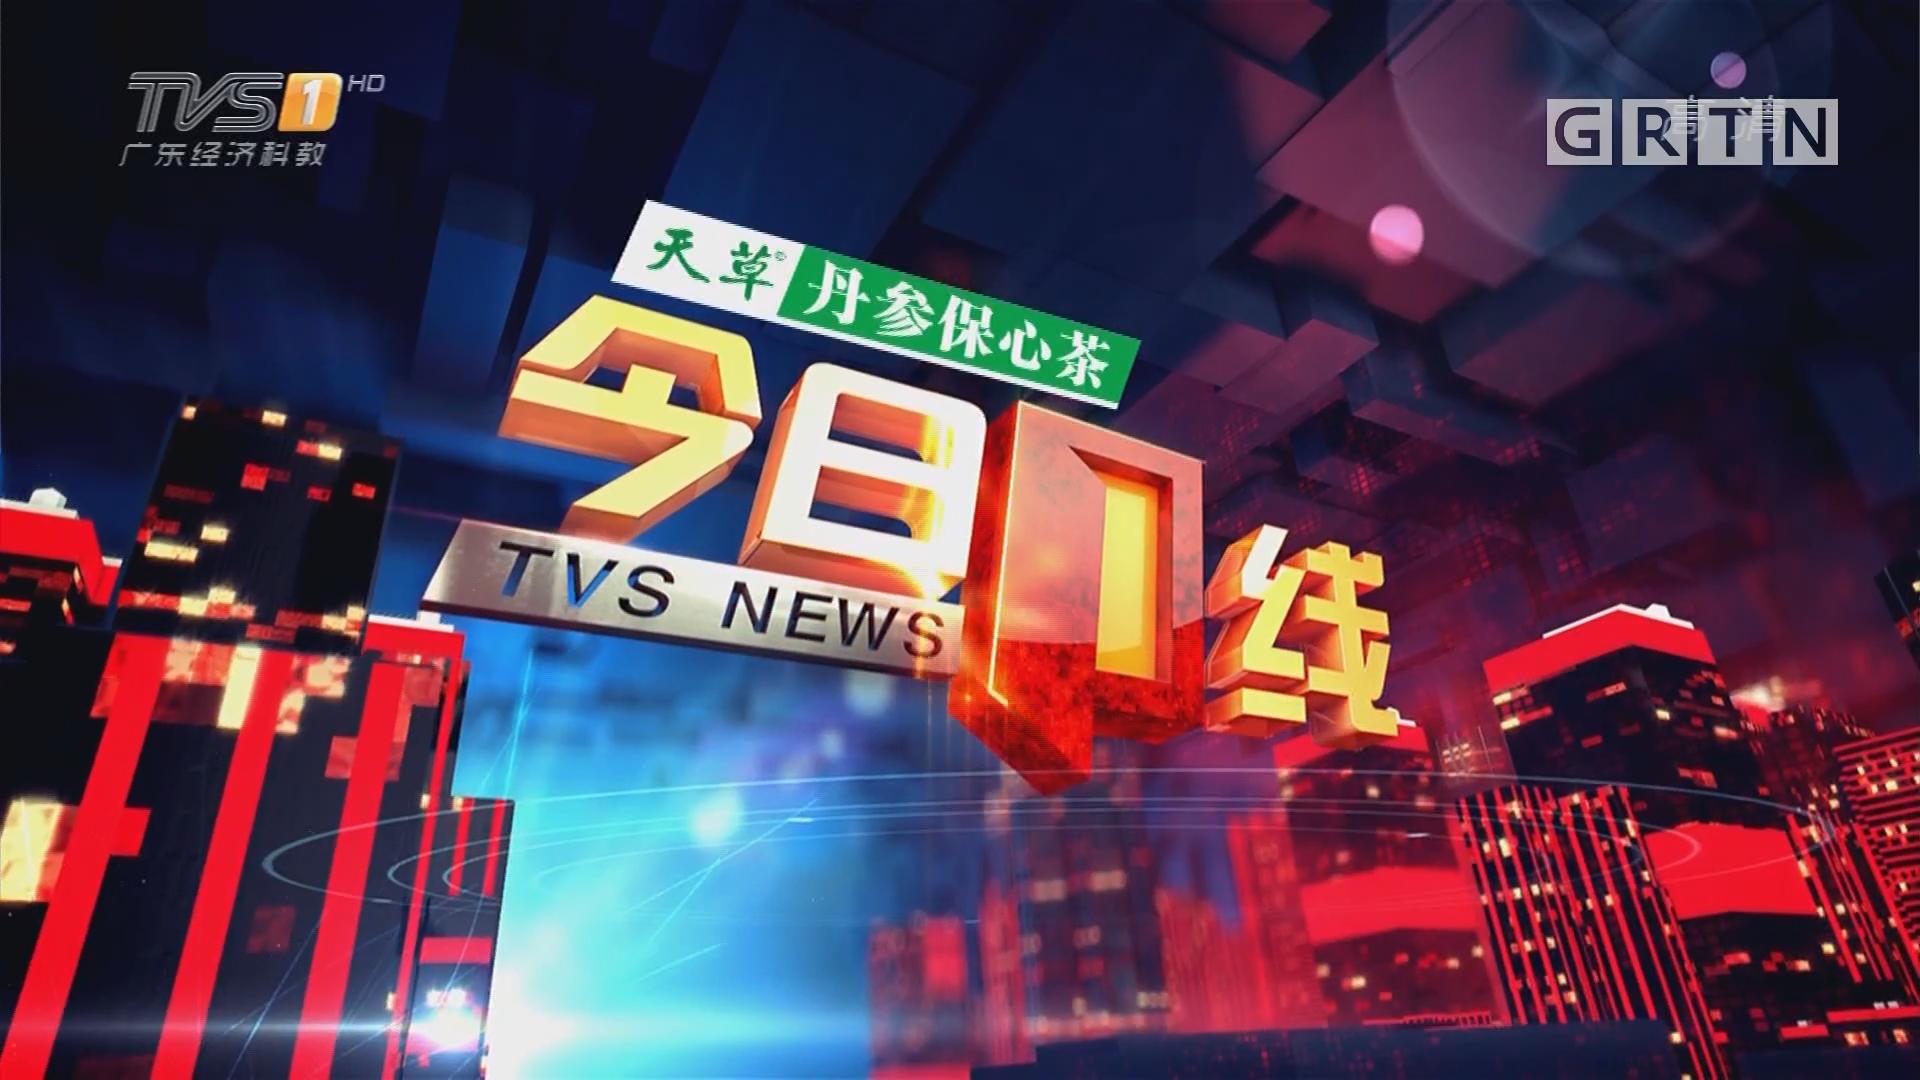 [HD][2019-01-13]今日一线:广州:河涌变绿追踪 今天水体已经恢复正常颜色